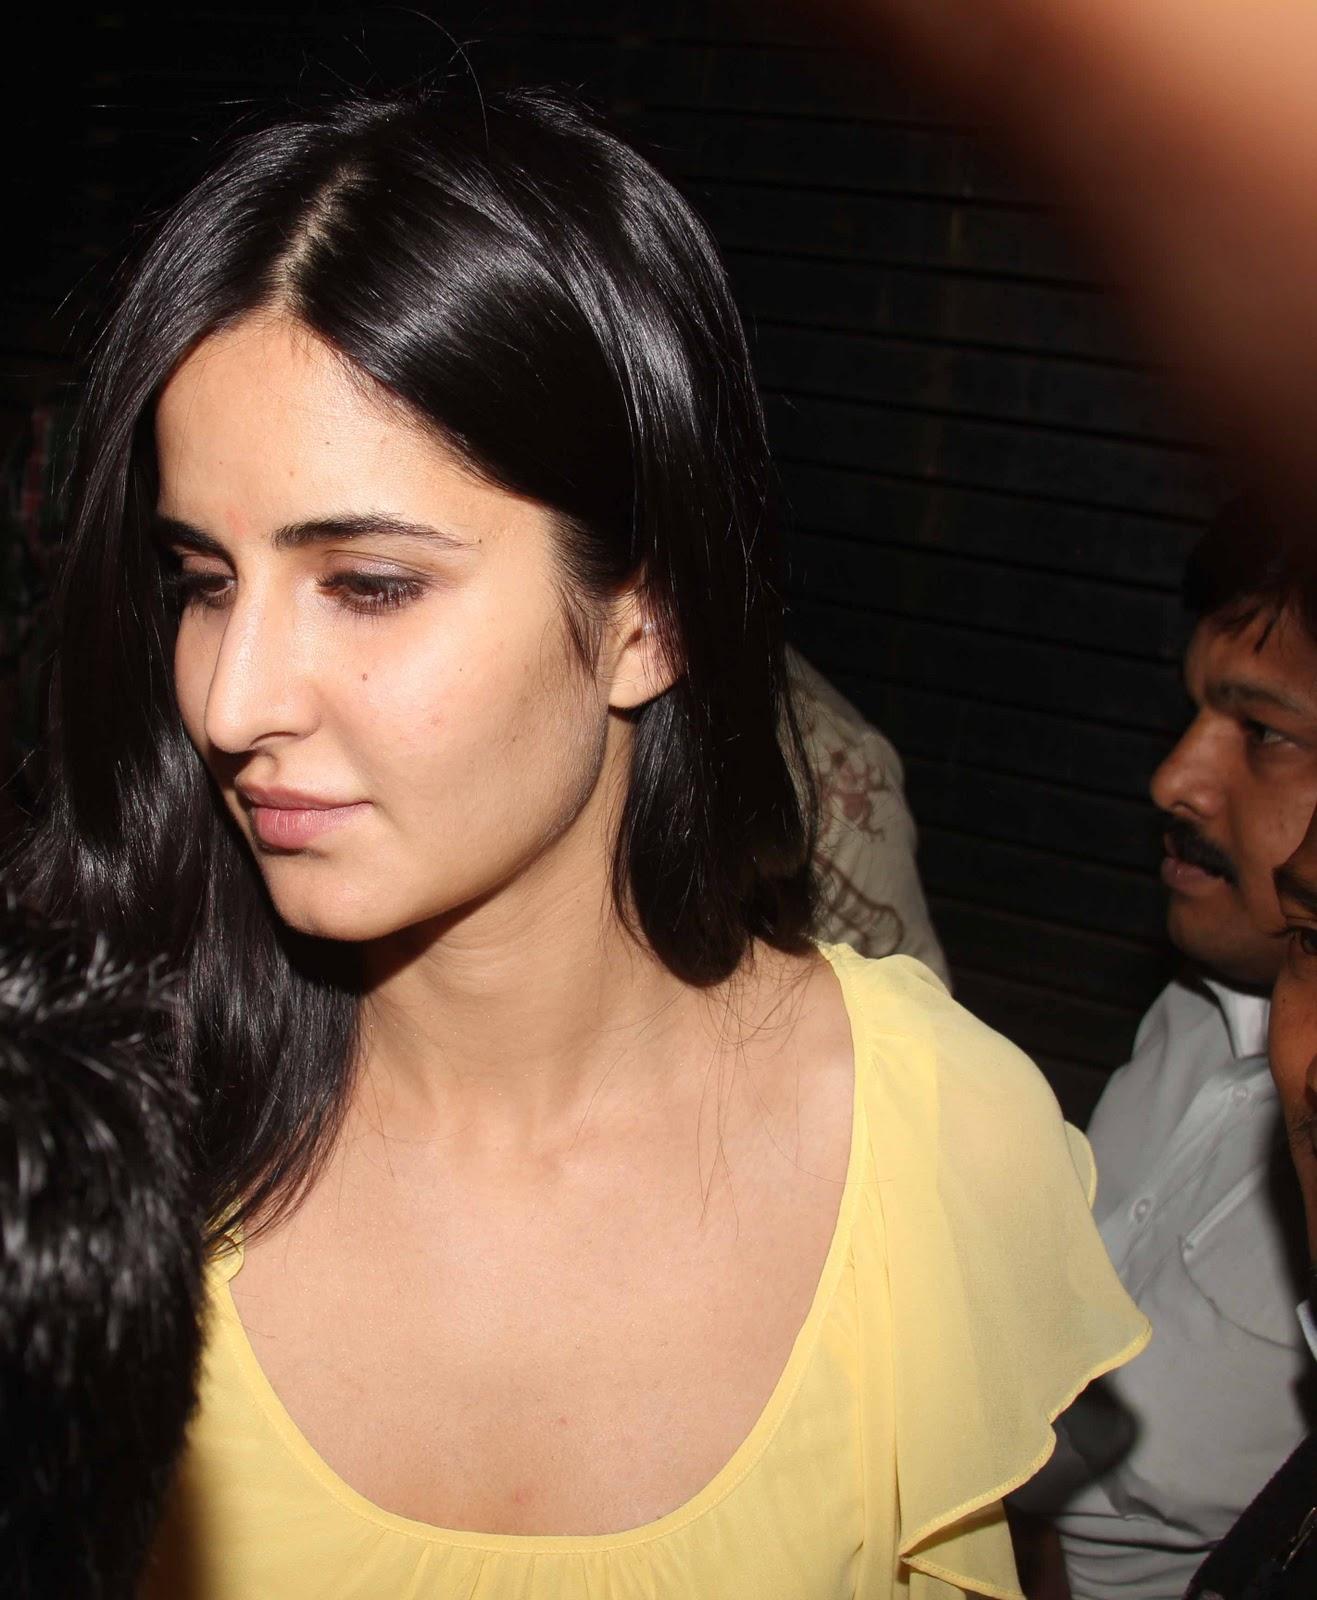 http://2.bp.blogspot.com/-bdGB-ju_4O8/TwxpSqj9c6I/AAAAAAAAQ1w/_iunk8AEA5w/s1600/Bollywood-Stars-At-Farhan-Akhtar-Birthday-Bash-32.JPG